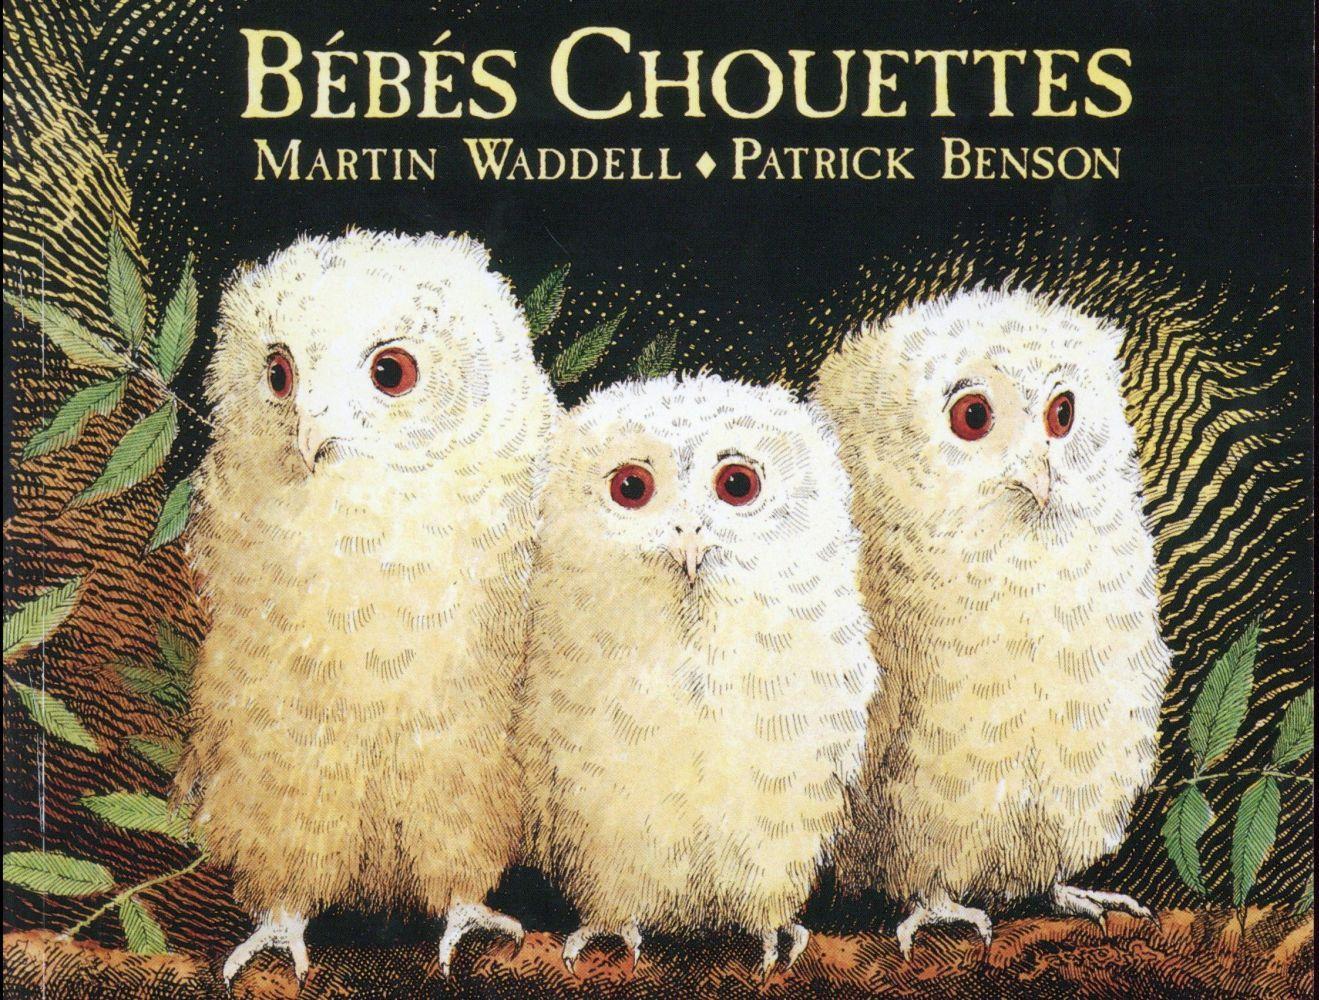 BEBES CHOUETTES WADDELL/BENSON EDL